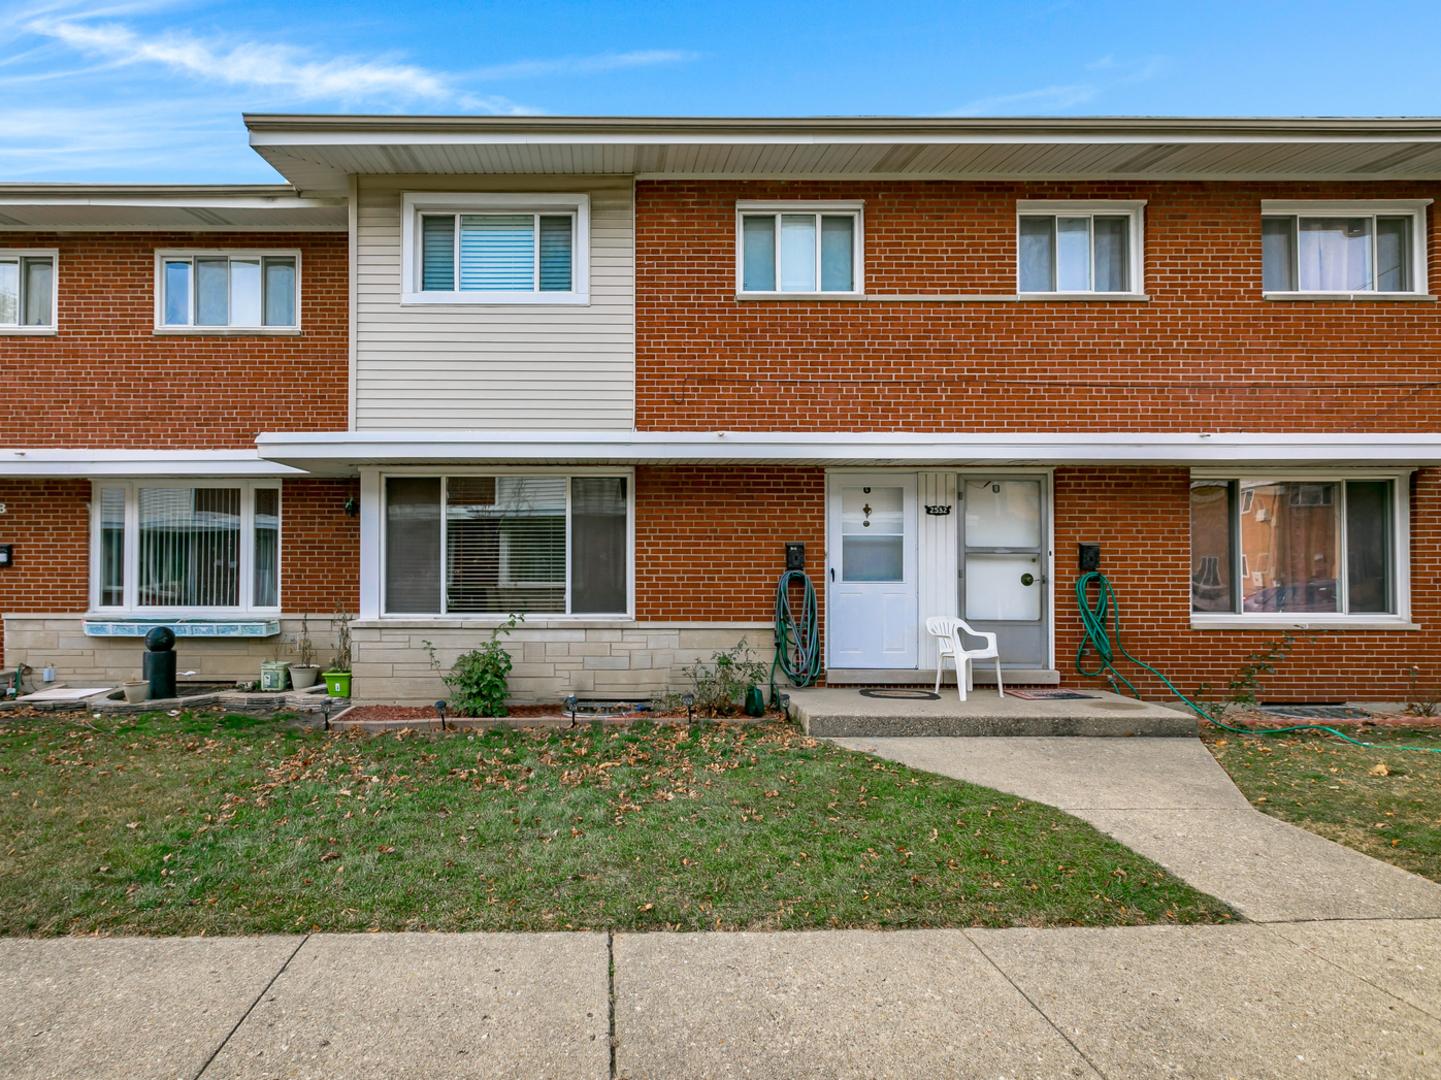 2532 W BIRCHWOOD Avenue Unit C, Chicago IL 60645